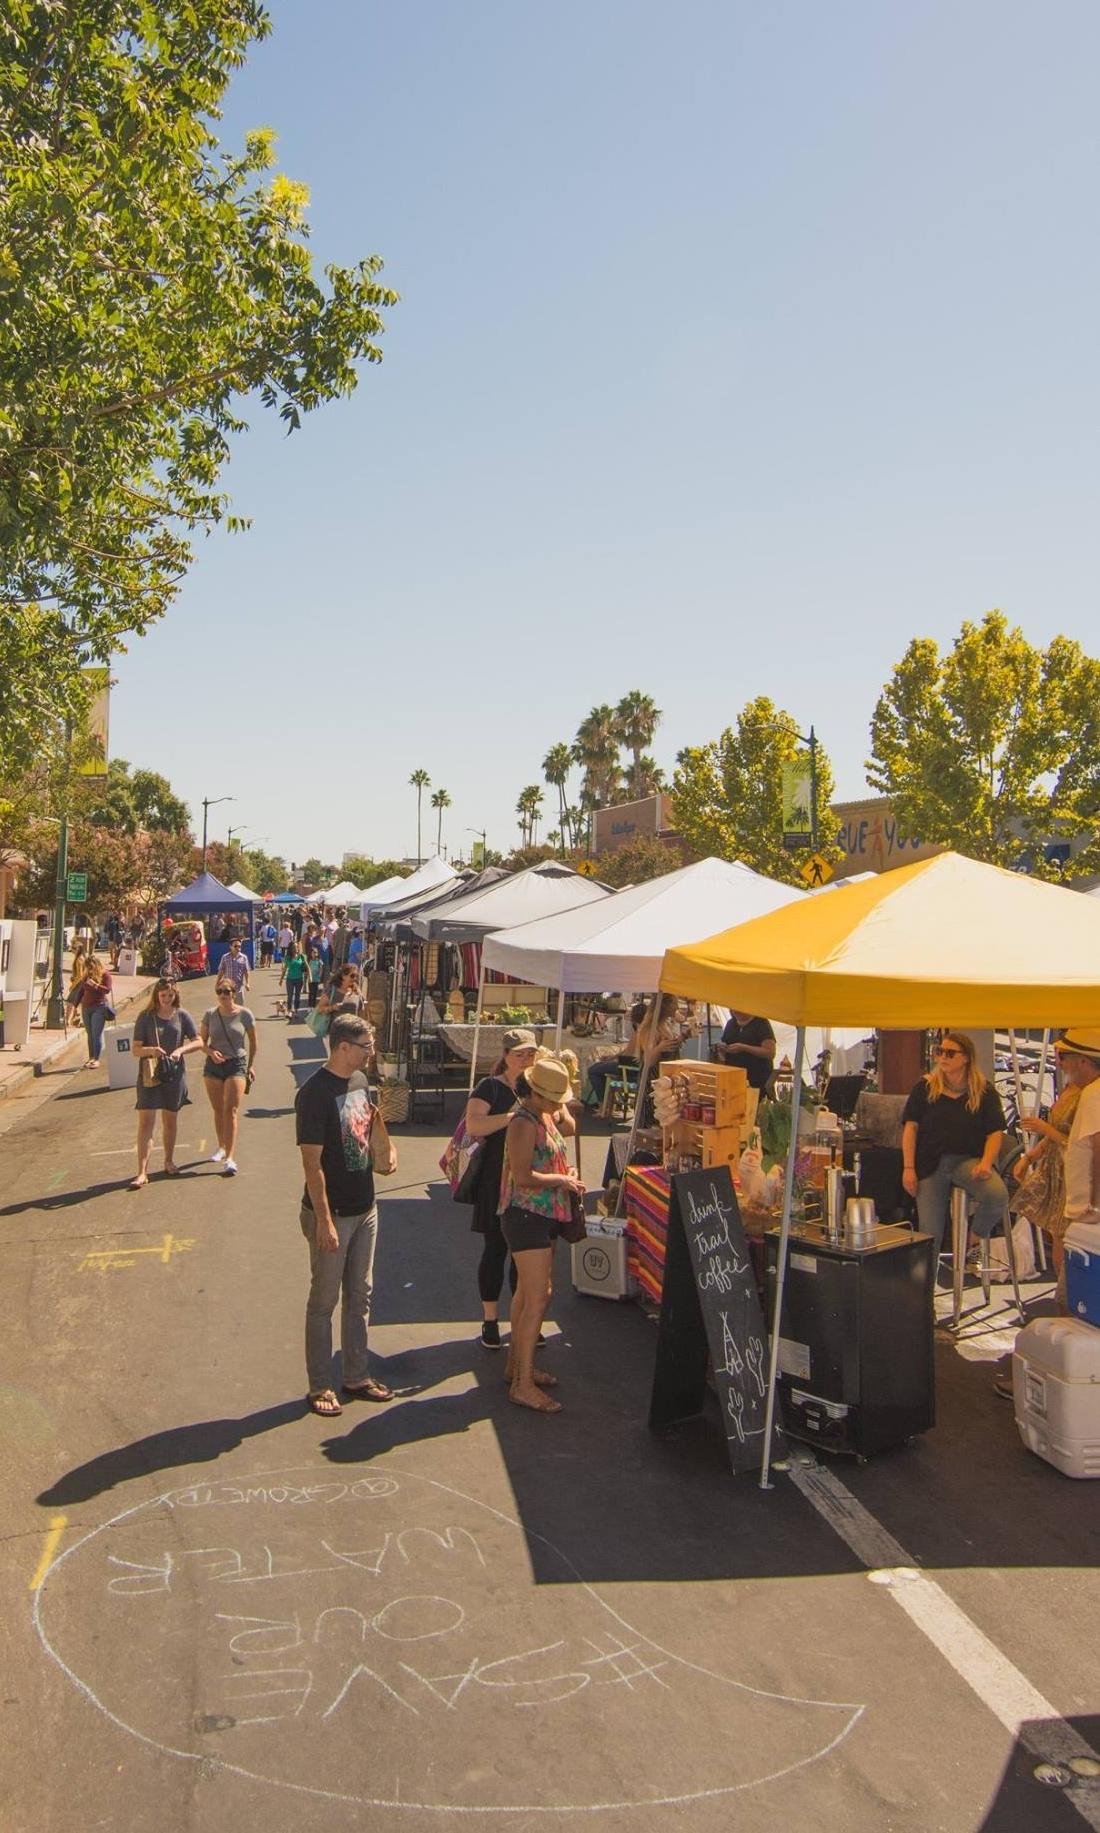 Street Fair Stockmarket Festival Makers Market Open Air California